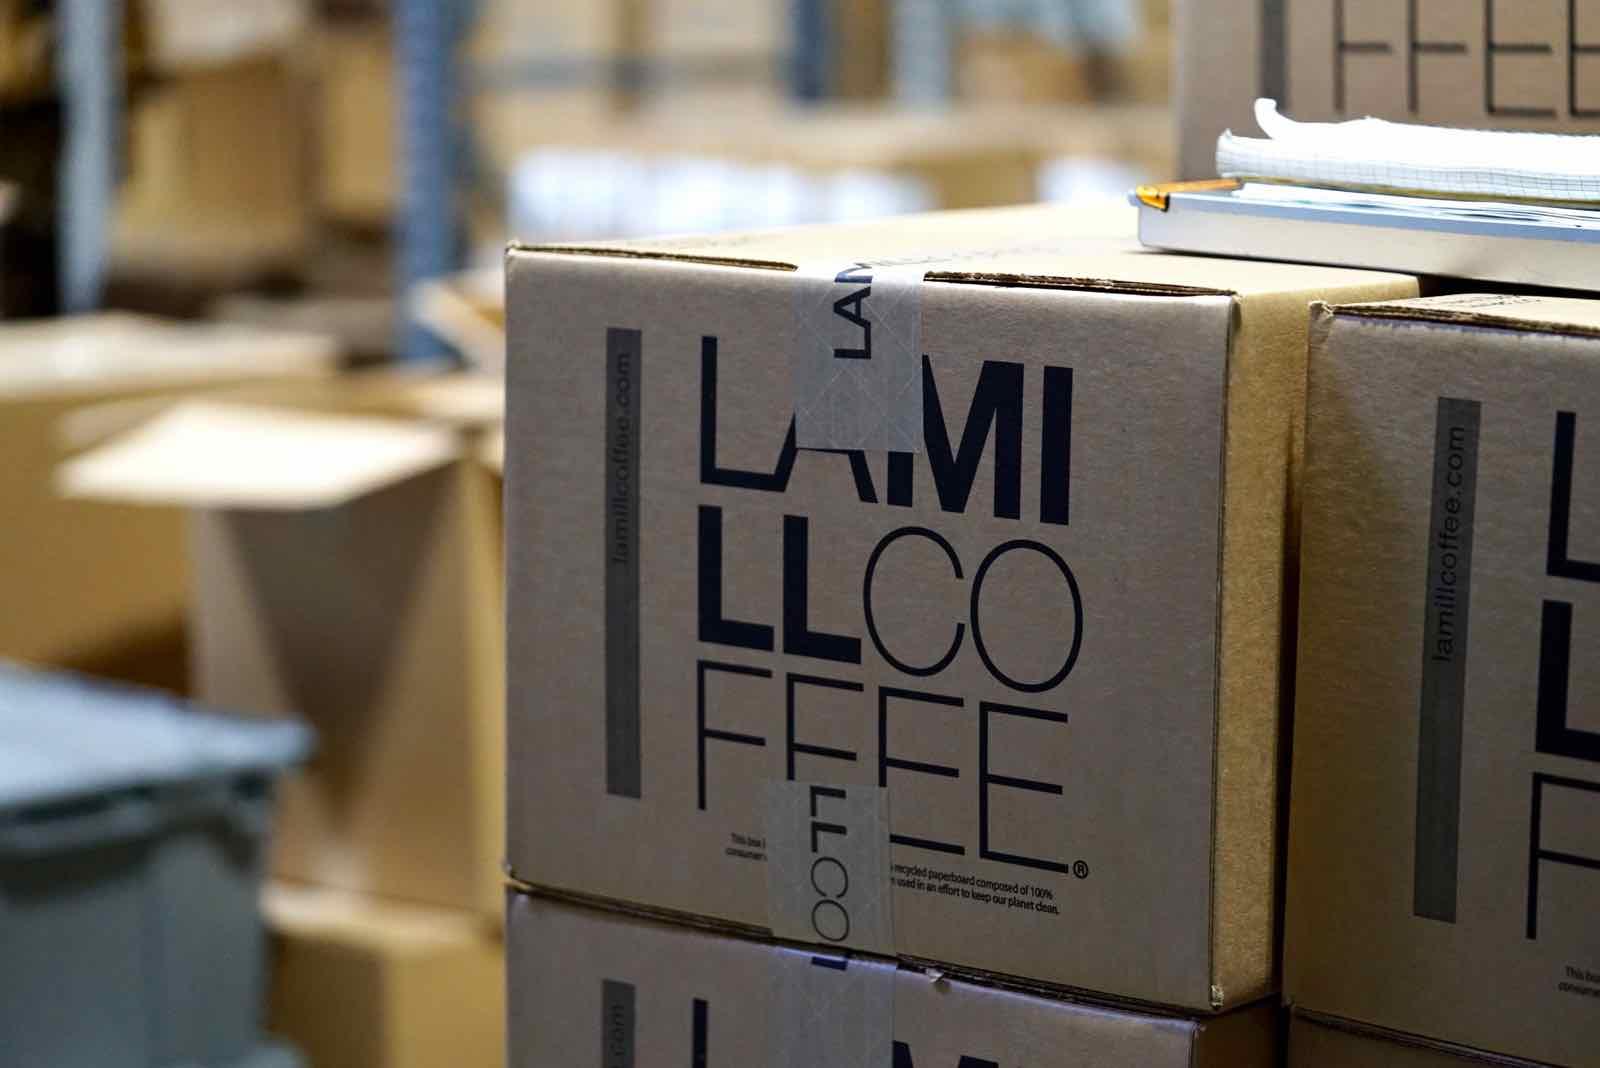 lamill-coffee-factory-tour-1.jpg